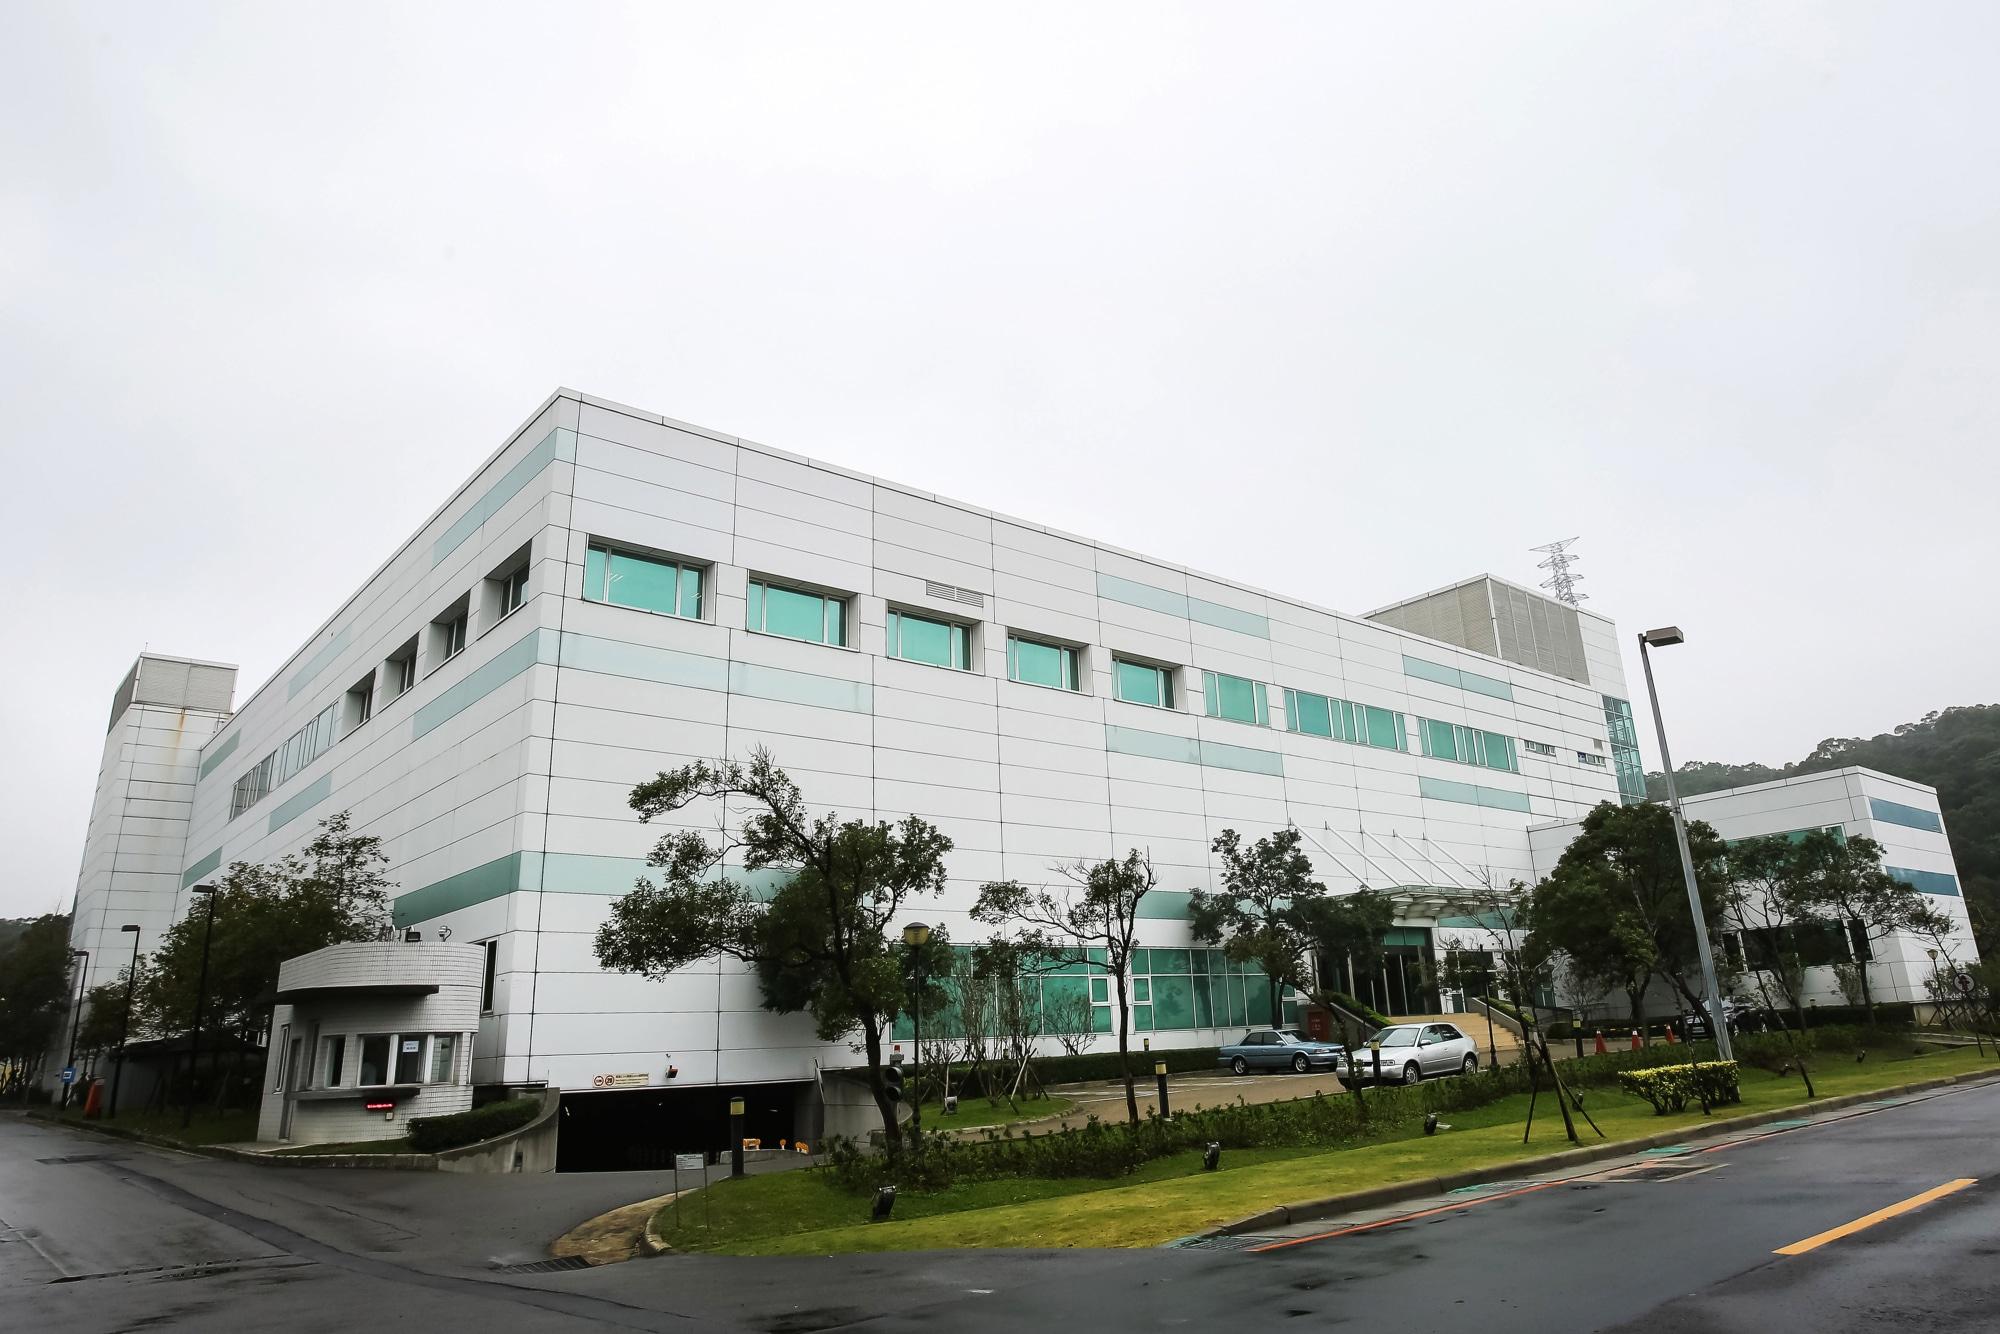 Longtan Taiwan - Pesquisa e desenvolvimento Apple